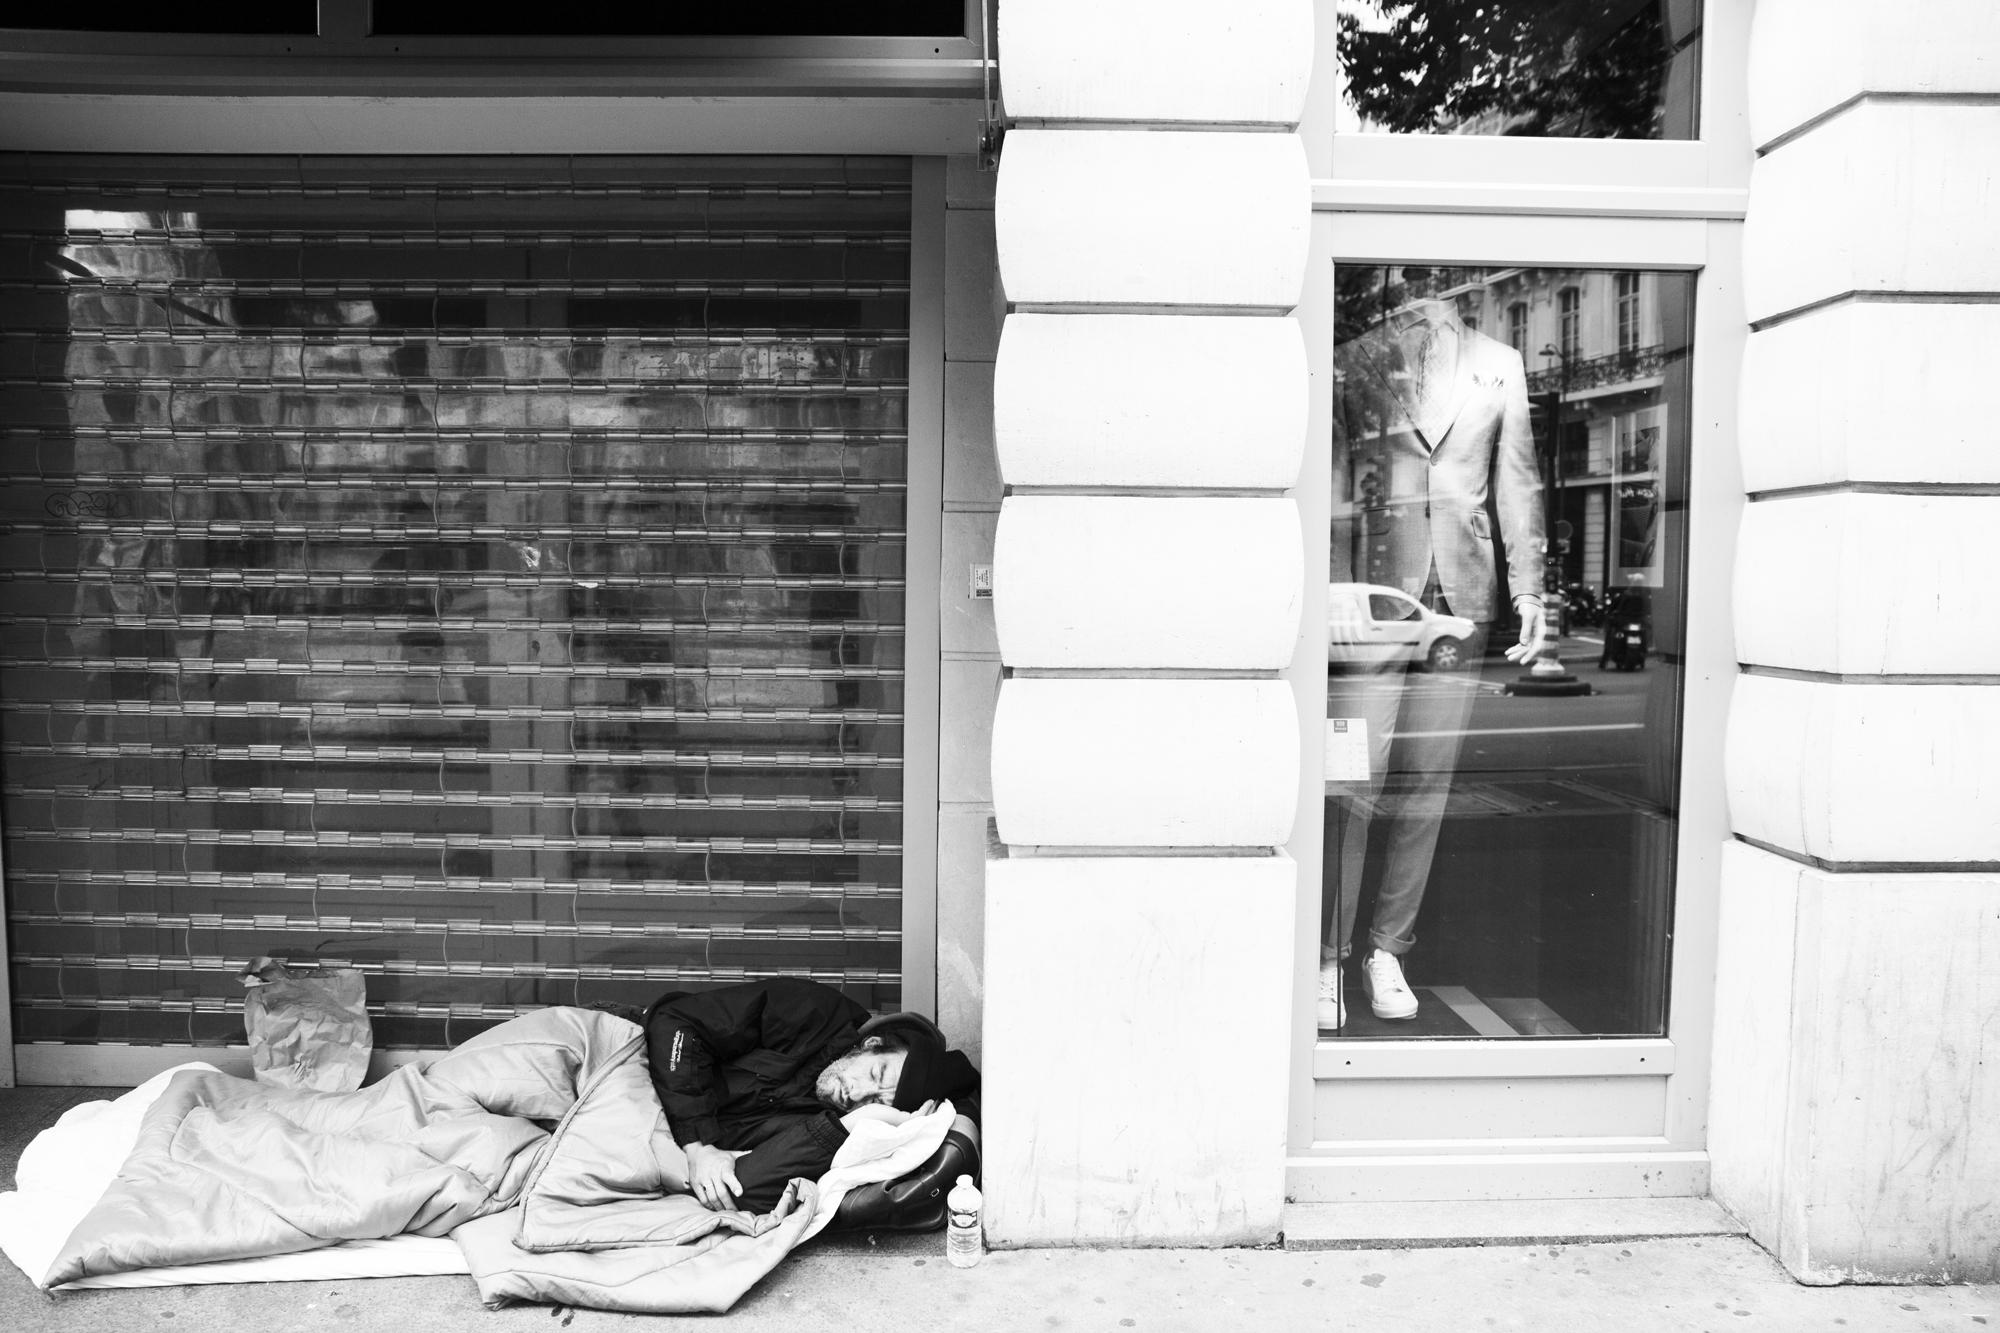 """A story of clothes"" - Boulevard Haussmann, Paris (2019). © Clémence Rougetet"